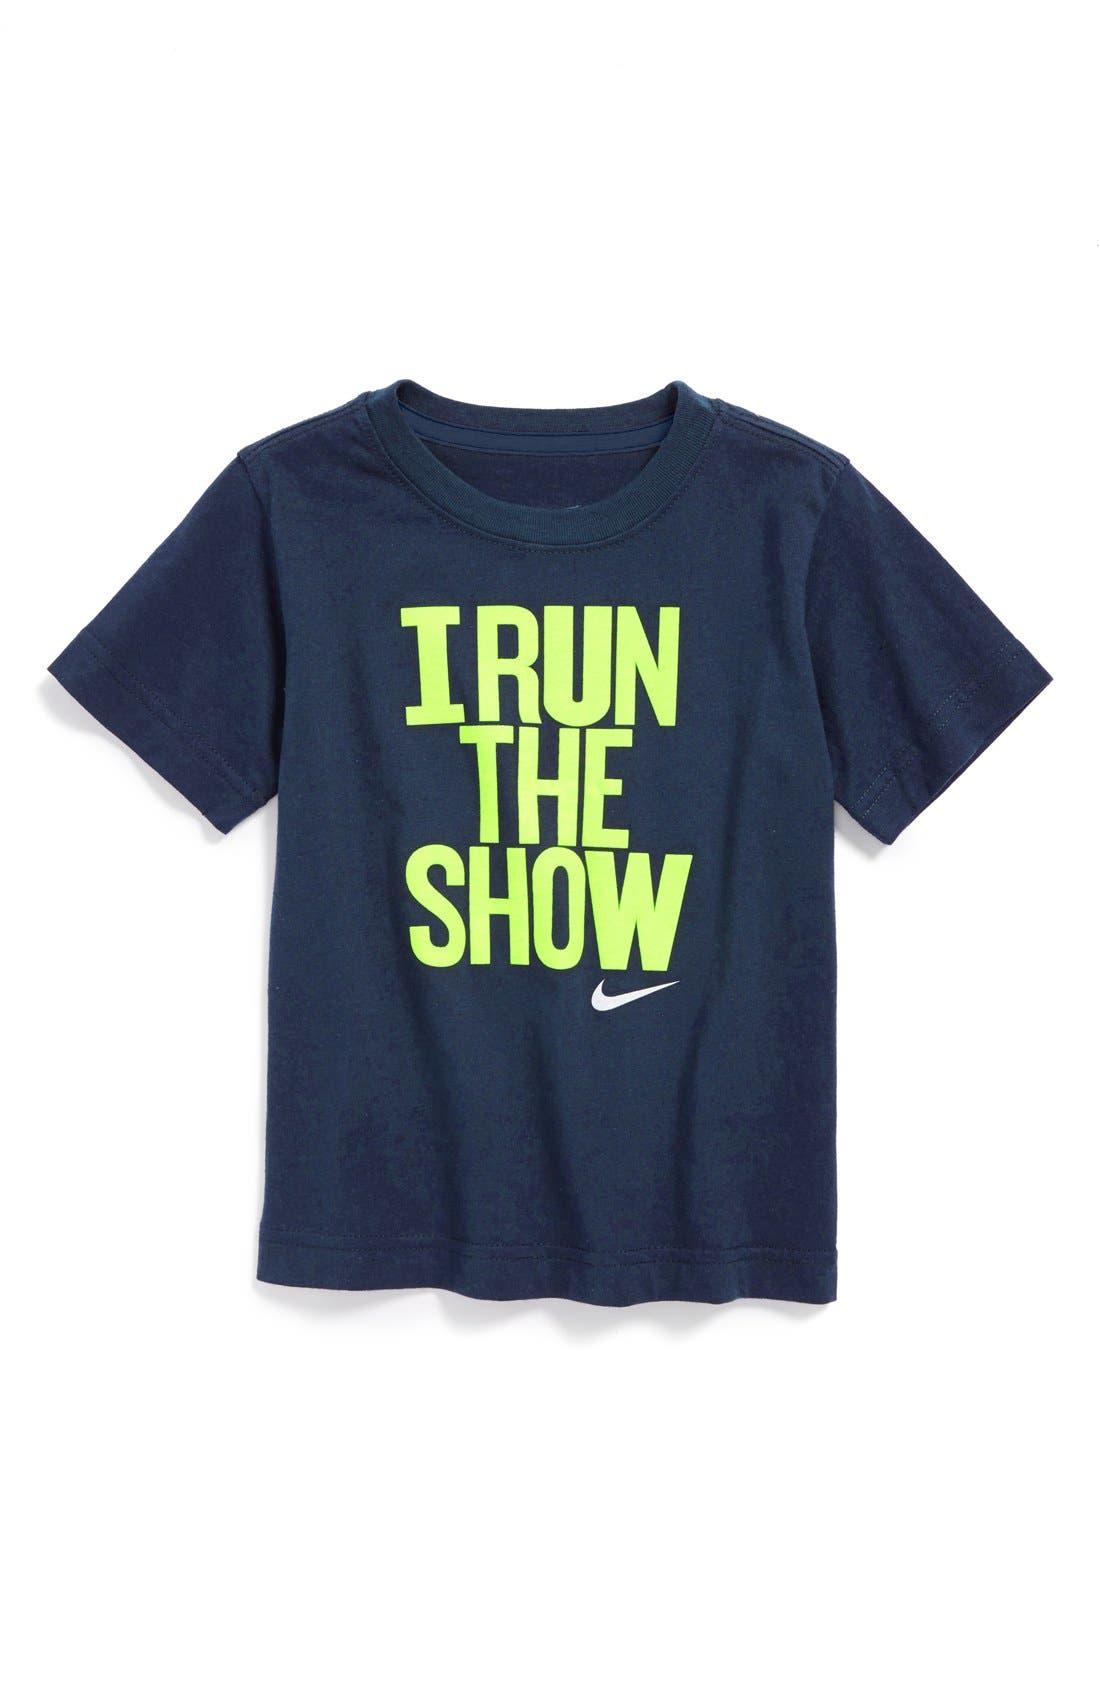 Alternate Image 1 Selected - Nike 'I Run The Show' Dri-FIT T-Shirt (Toddler Boys)